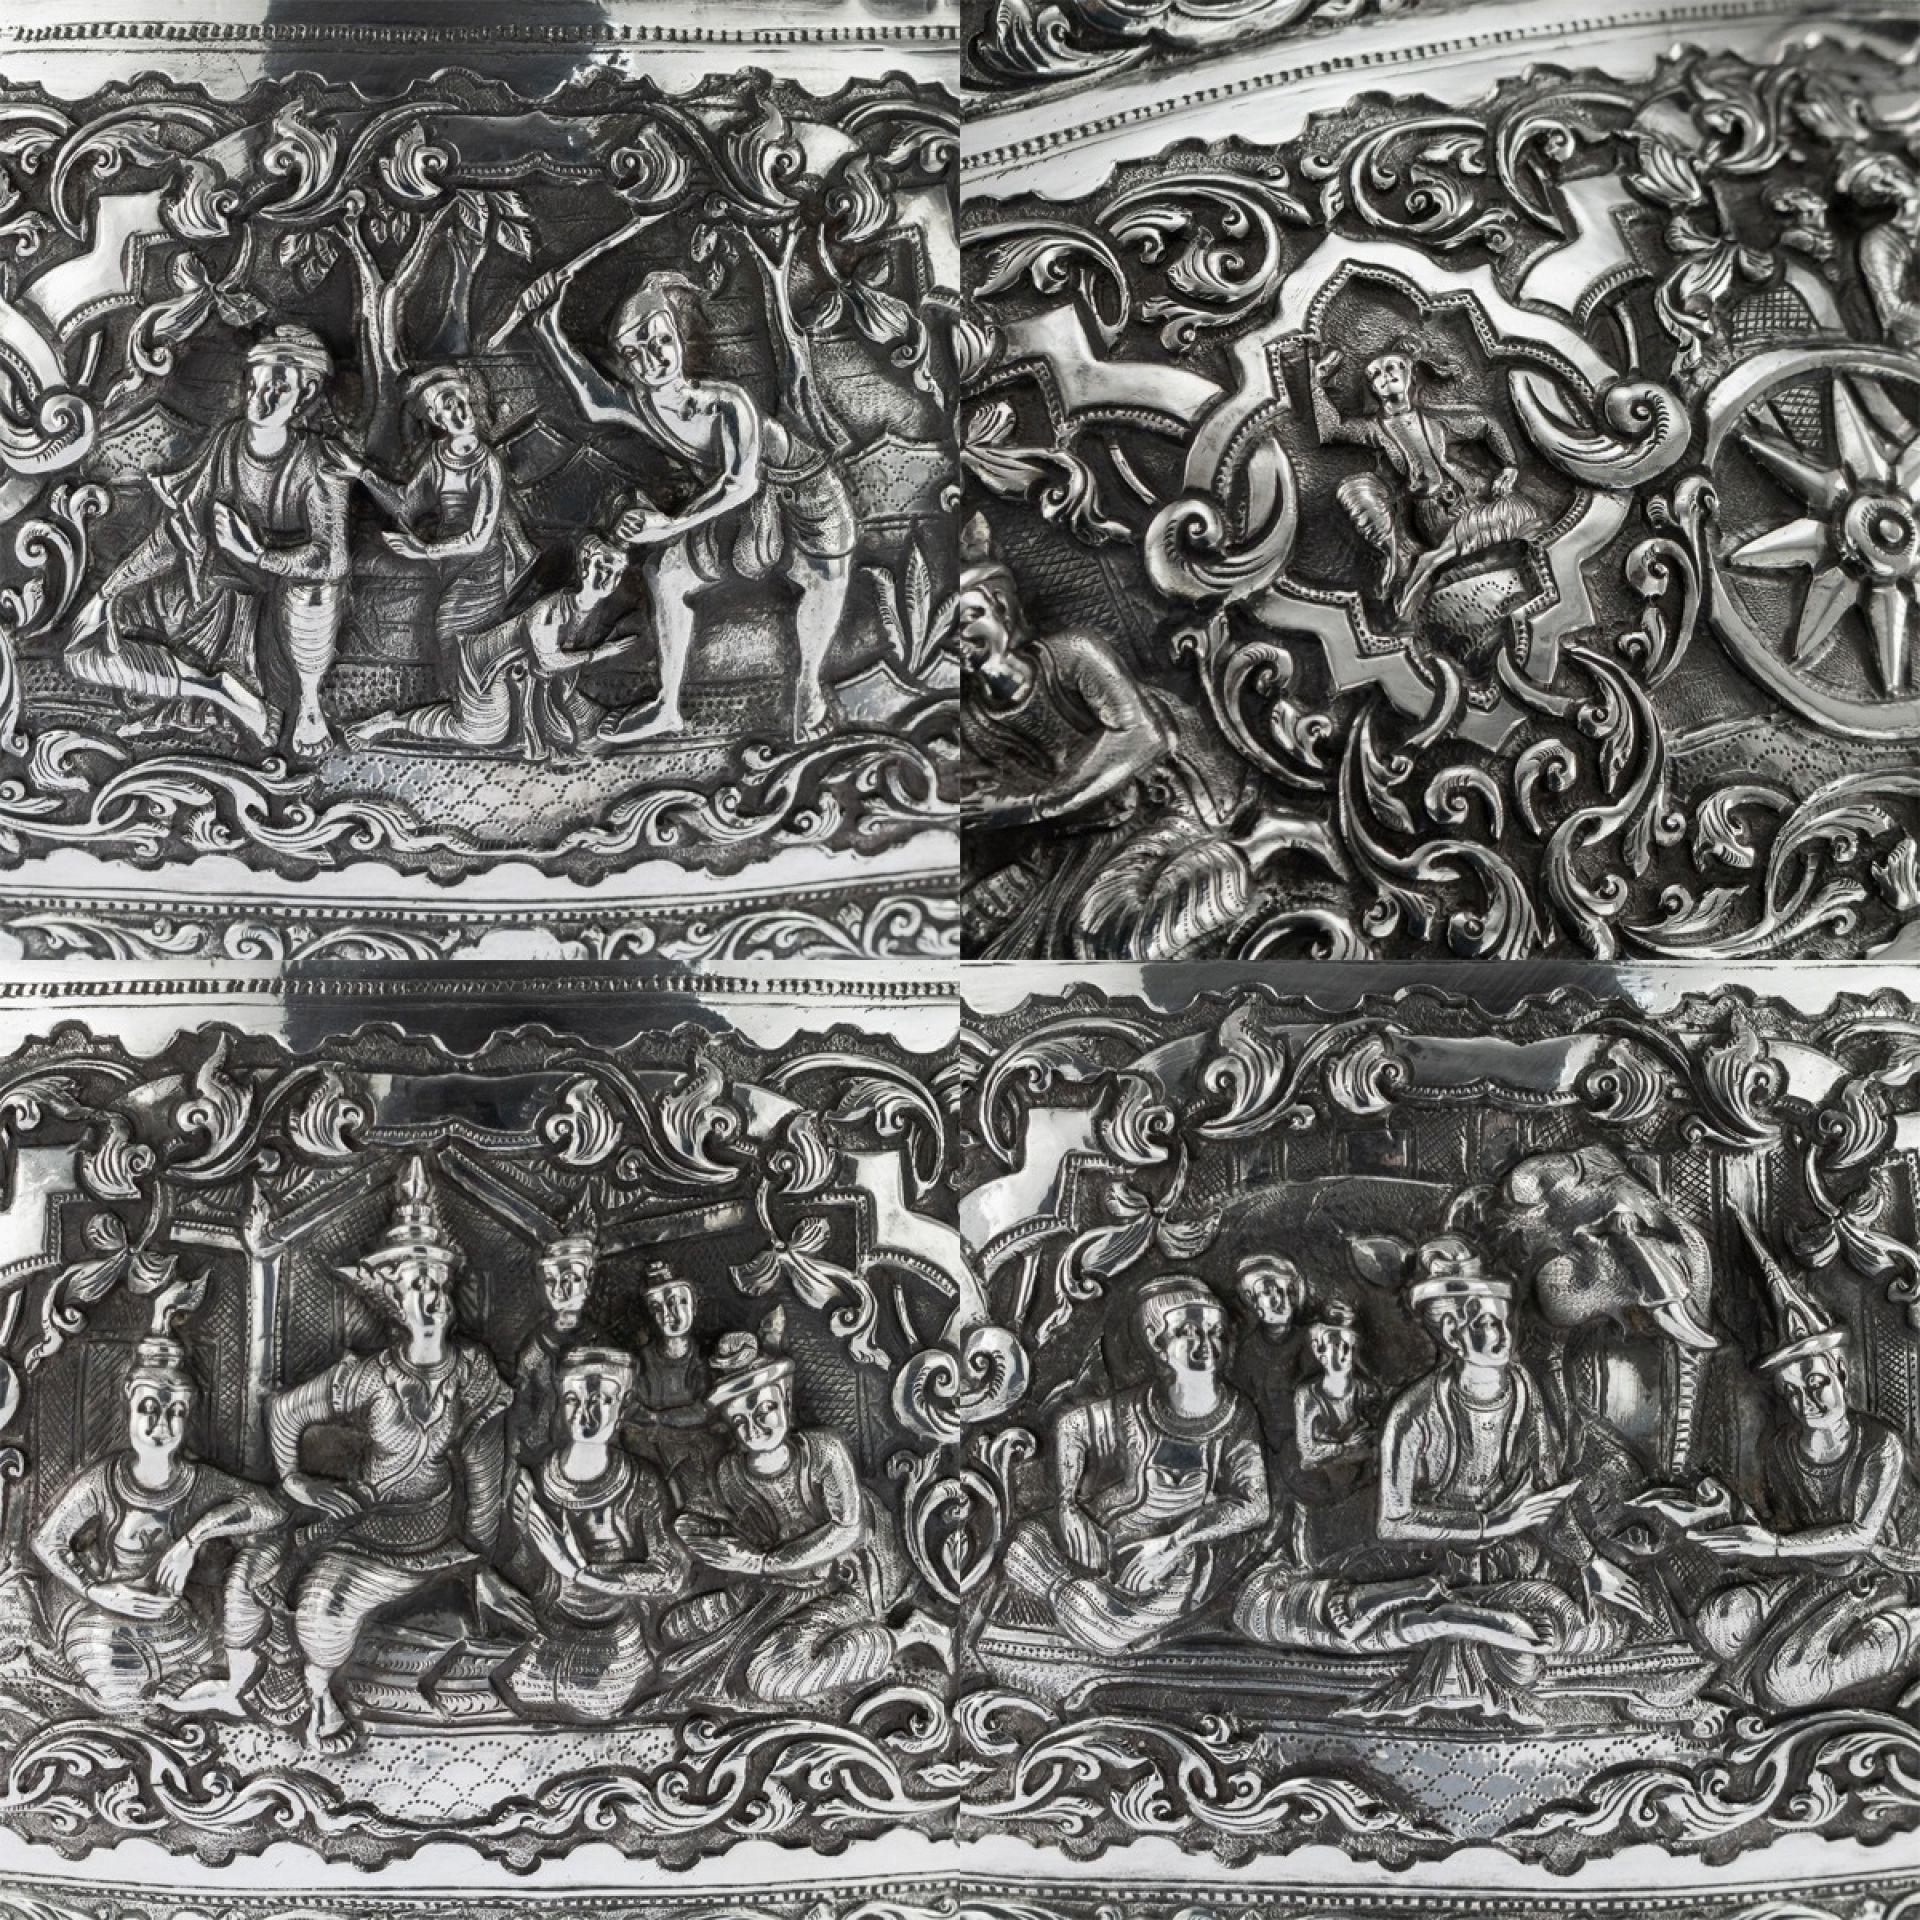 ANTIQUE 20thC MONUMENTAL BURMESE SOLID SILVER THABEIK BOWL, RANGOON c.1900